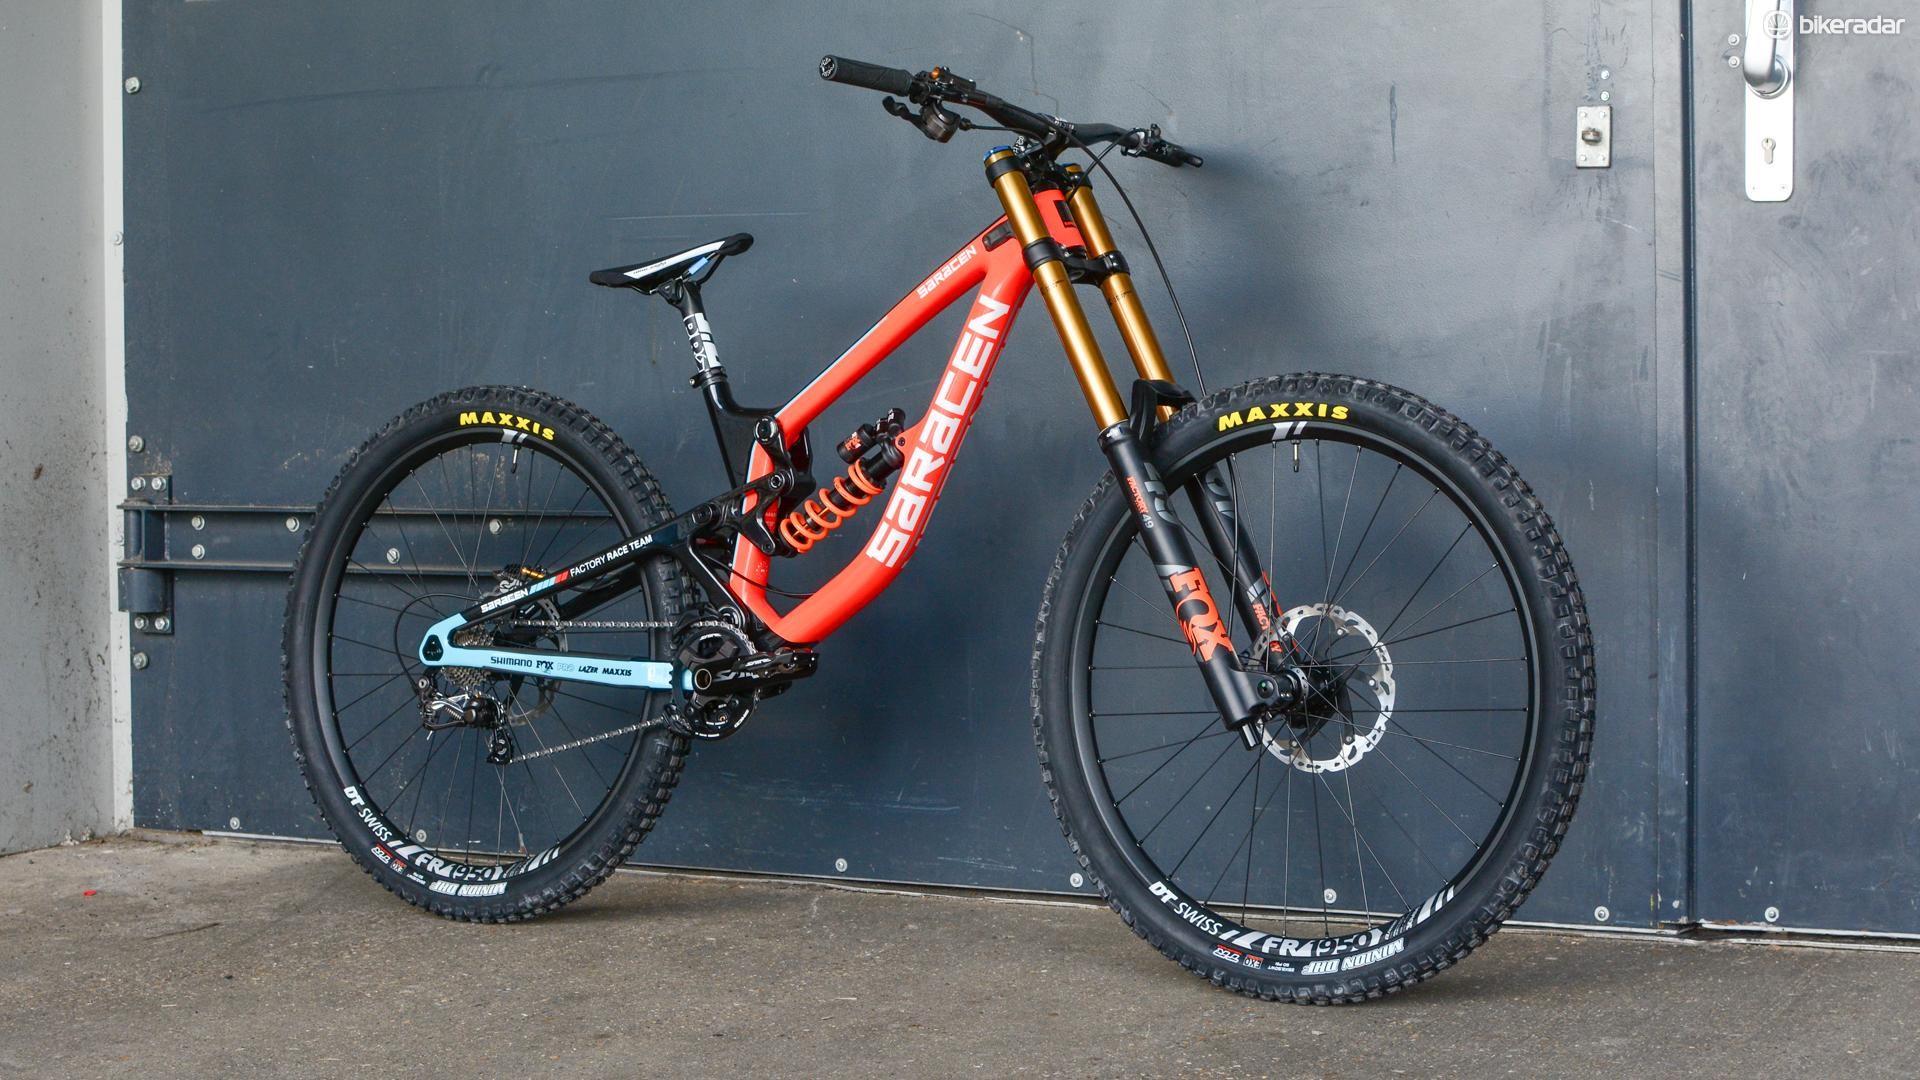 The Myst is a proper DH race bike